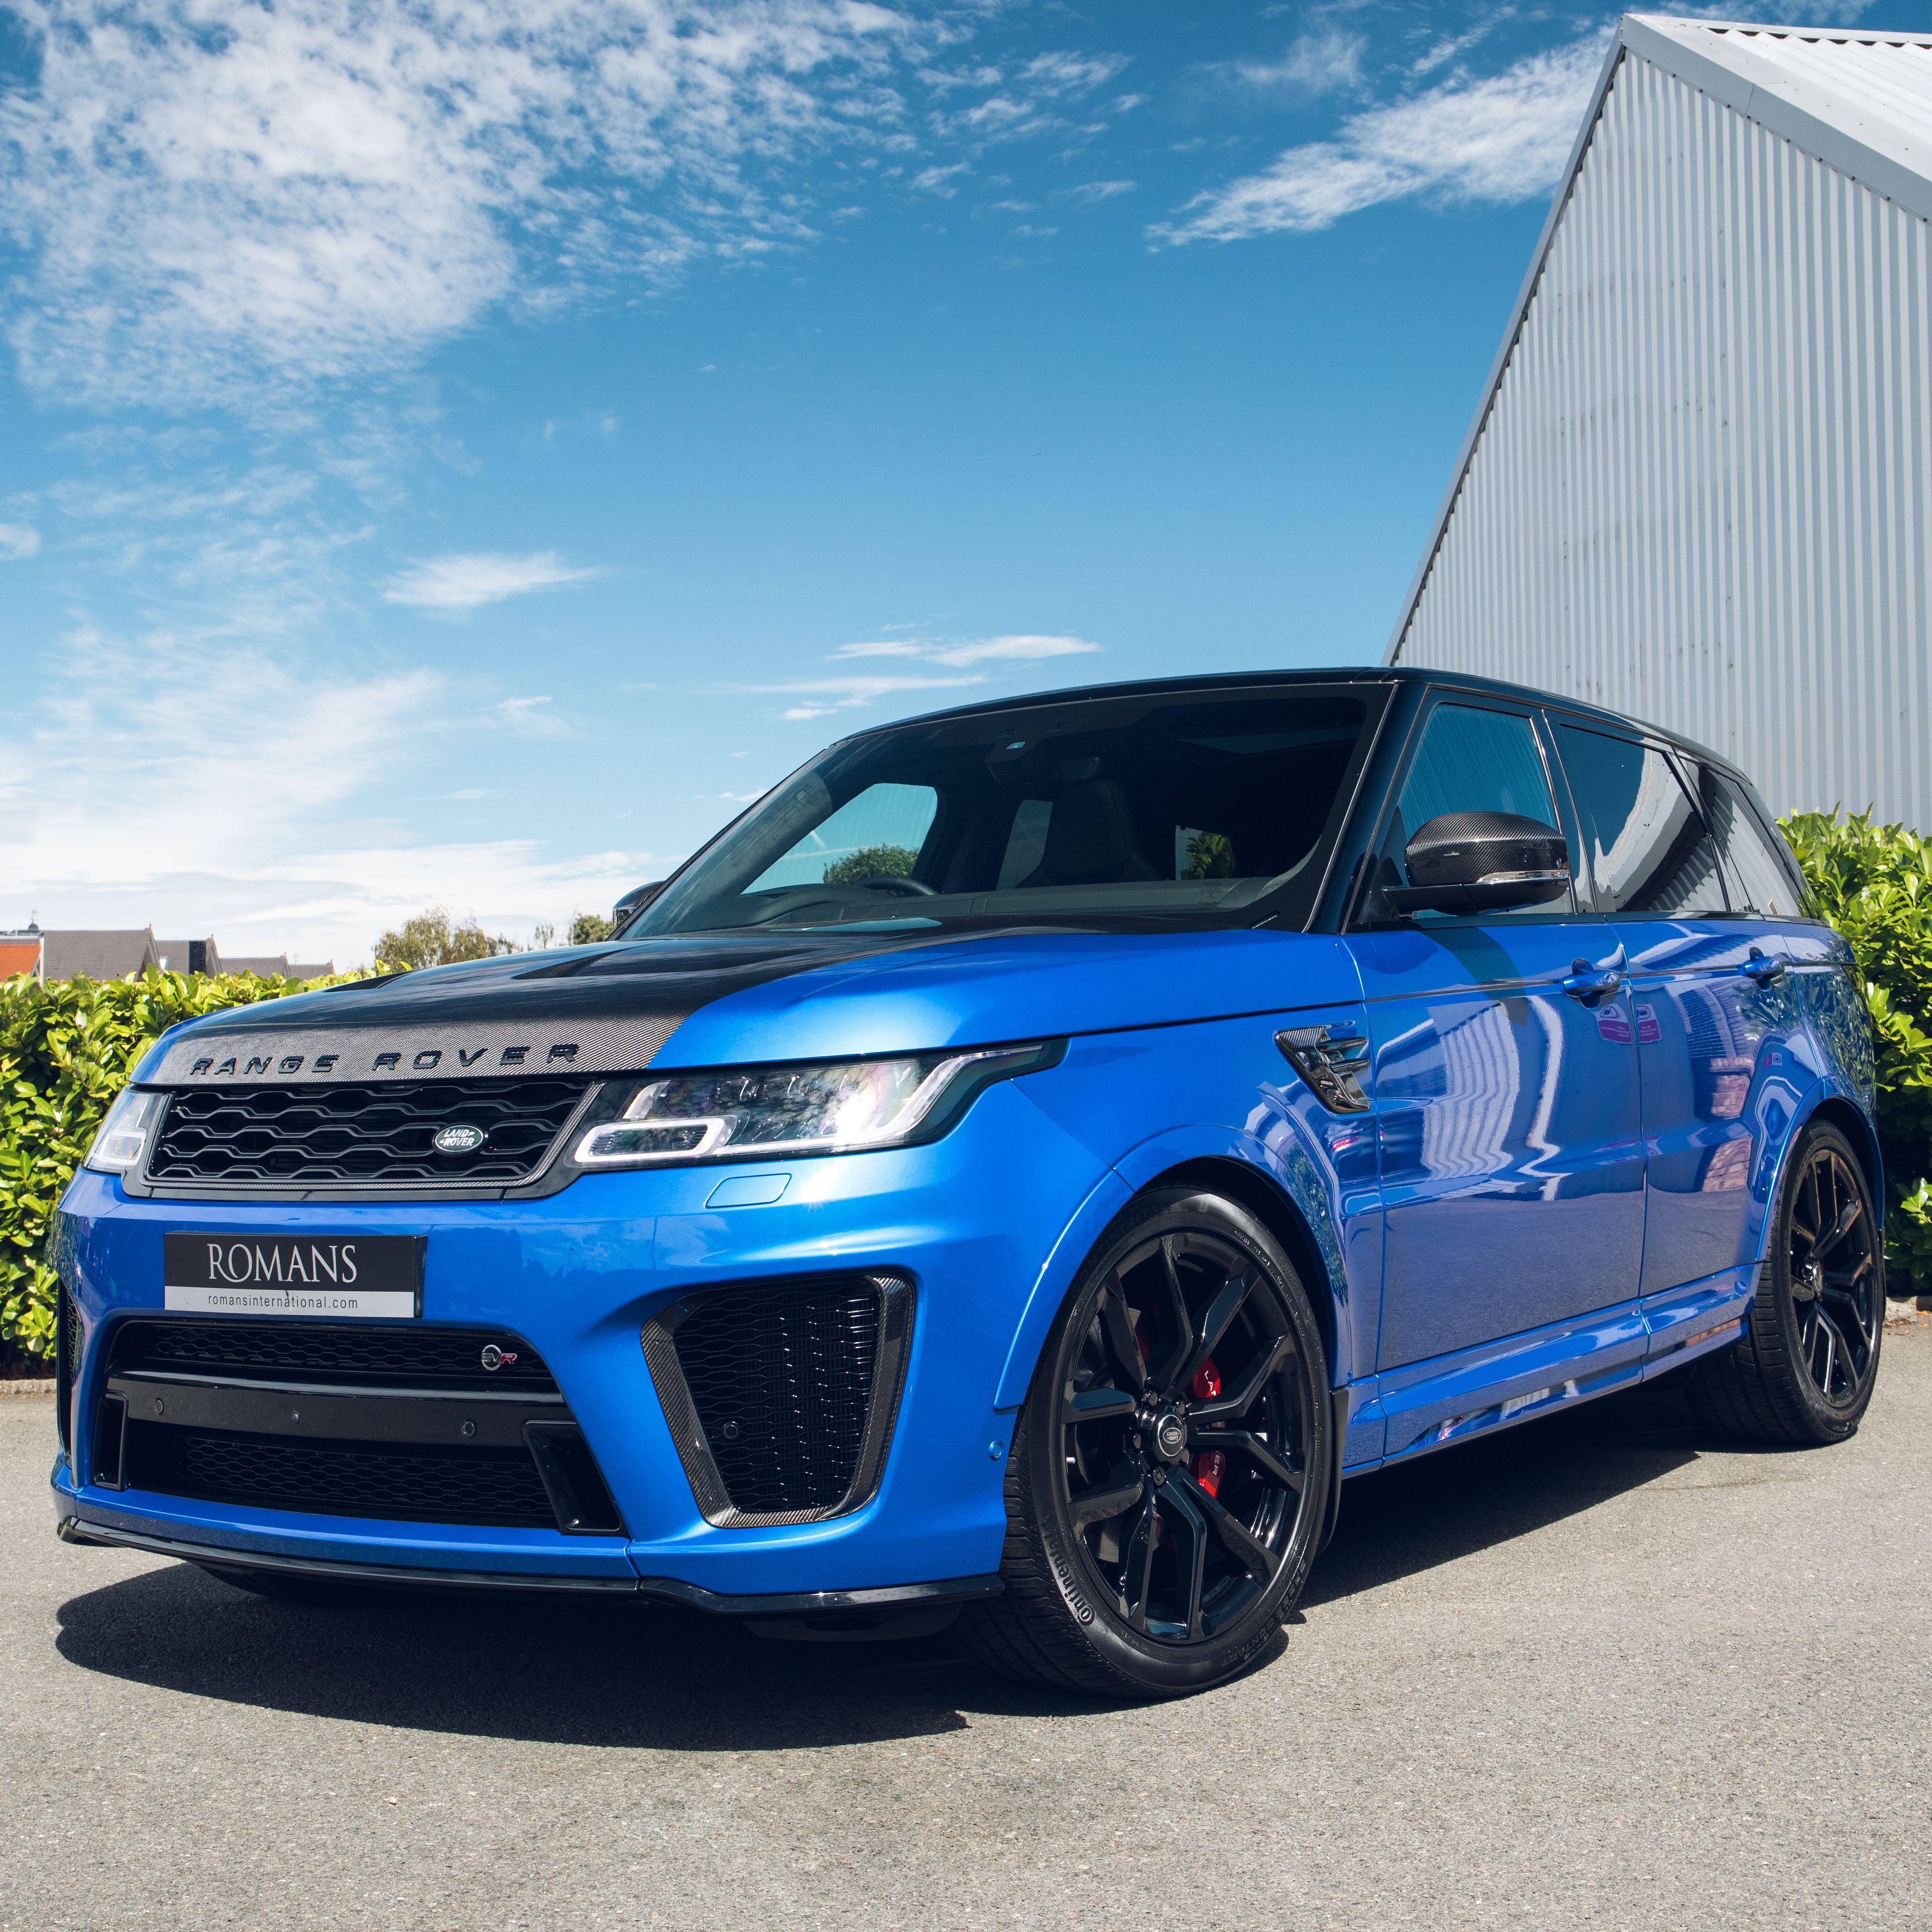 Range Rover Sport SVR in 2020 All black range rover